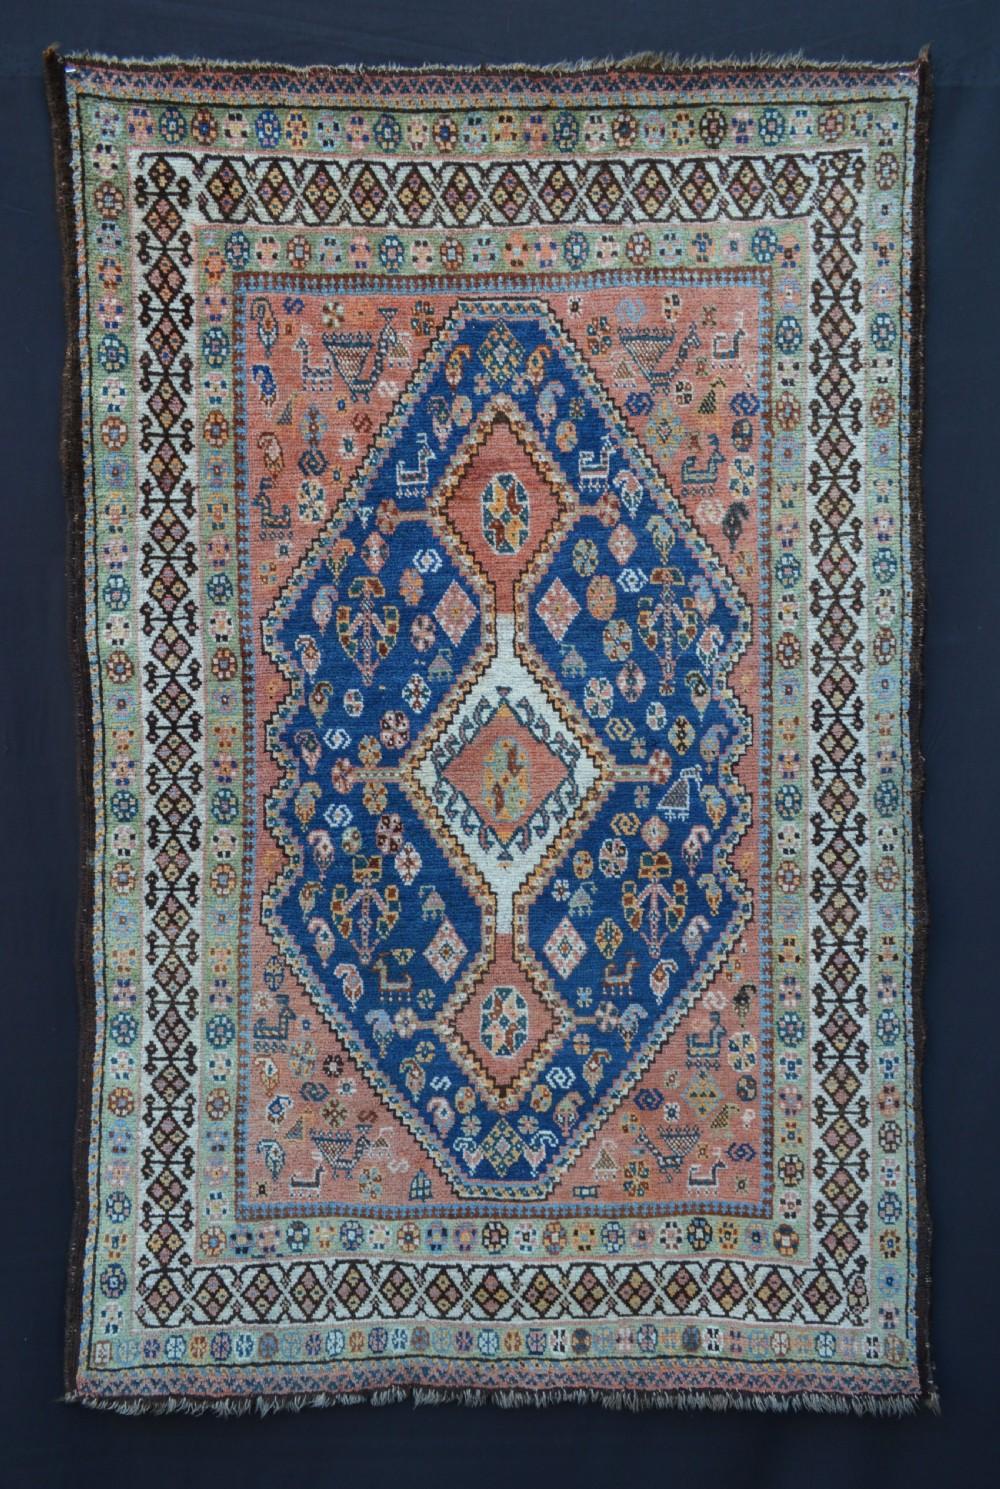 antique qashqa'i rug bolvardi taifeh fars province southwest persia